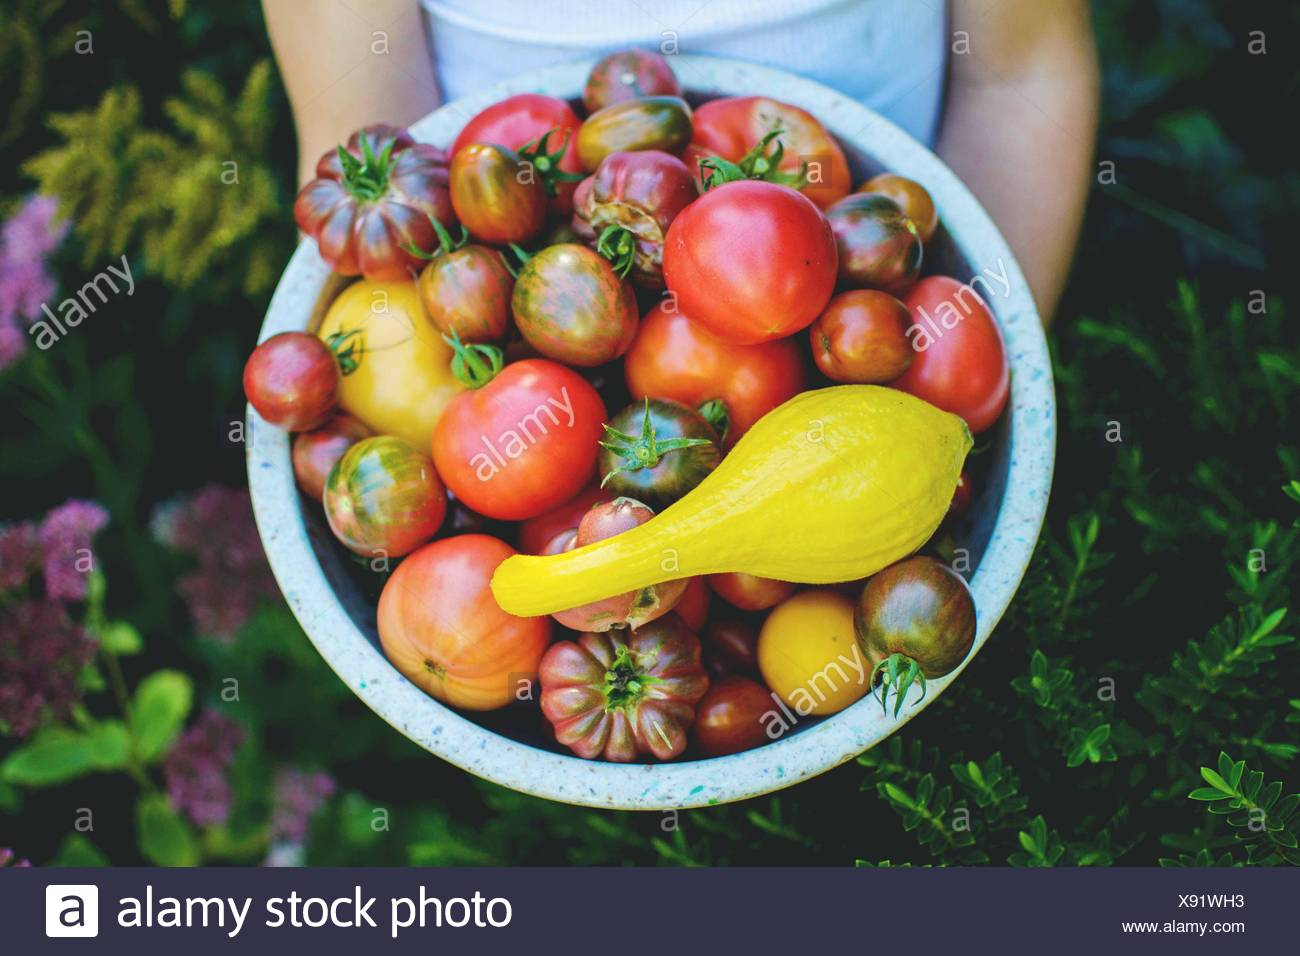 Child (4-5) holding bowl of garden tomatoes - Stock Image